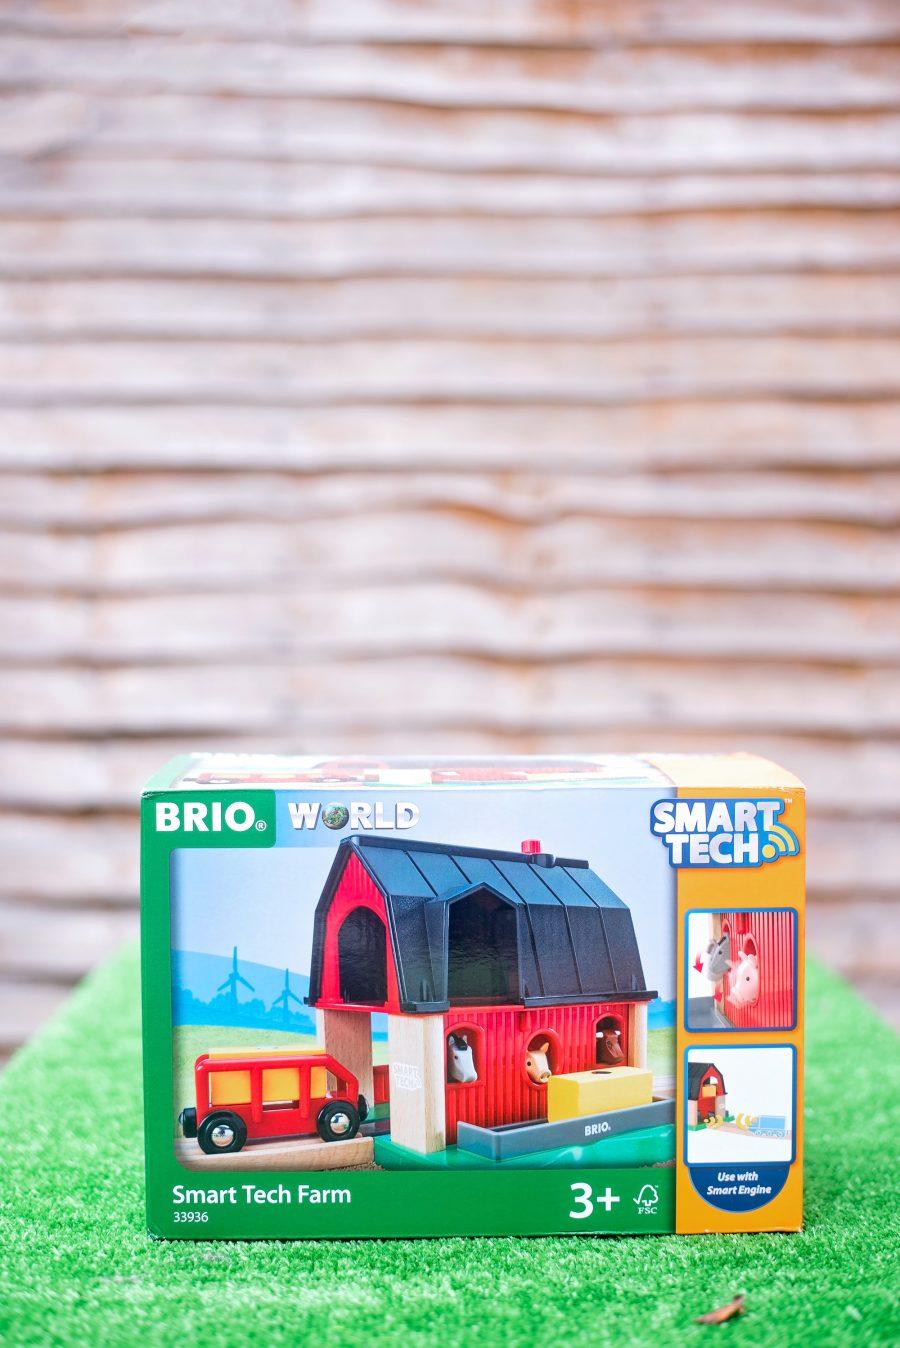 BRIO Smart Tech Farm